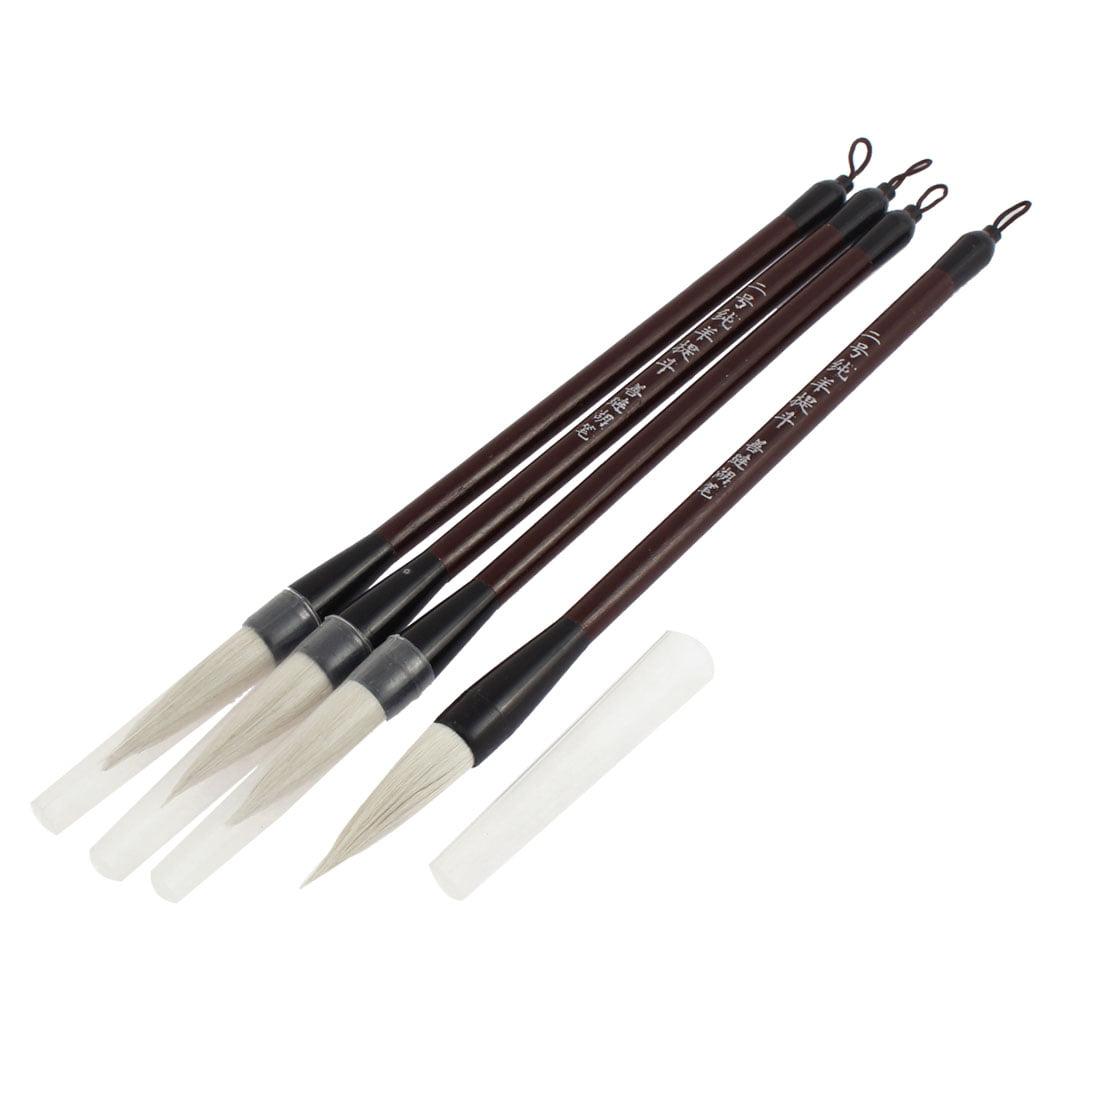 Unique Bargains Chinese Traditional Writing Pen Brush 12  Length 4PCS